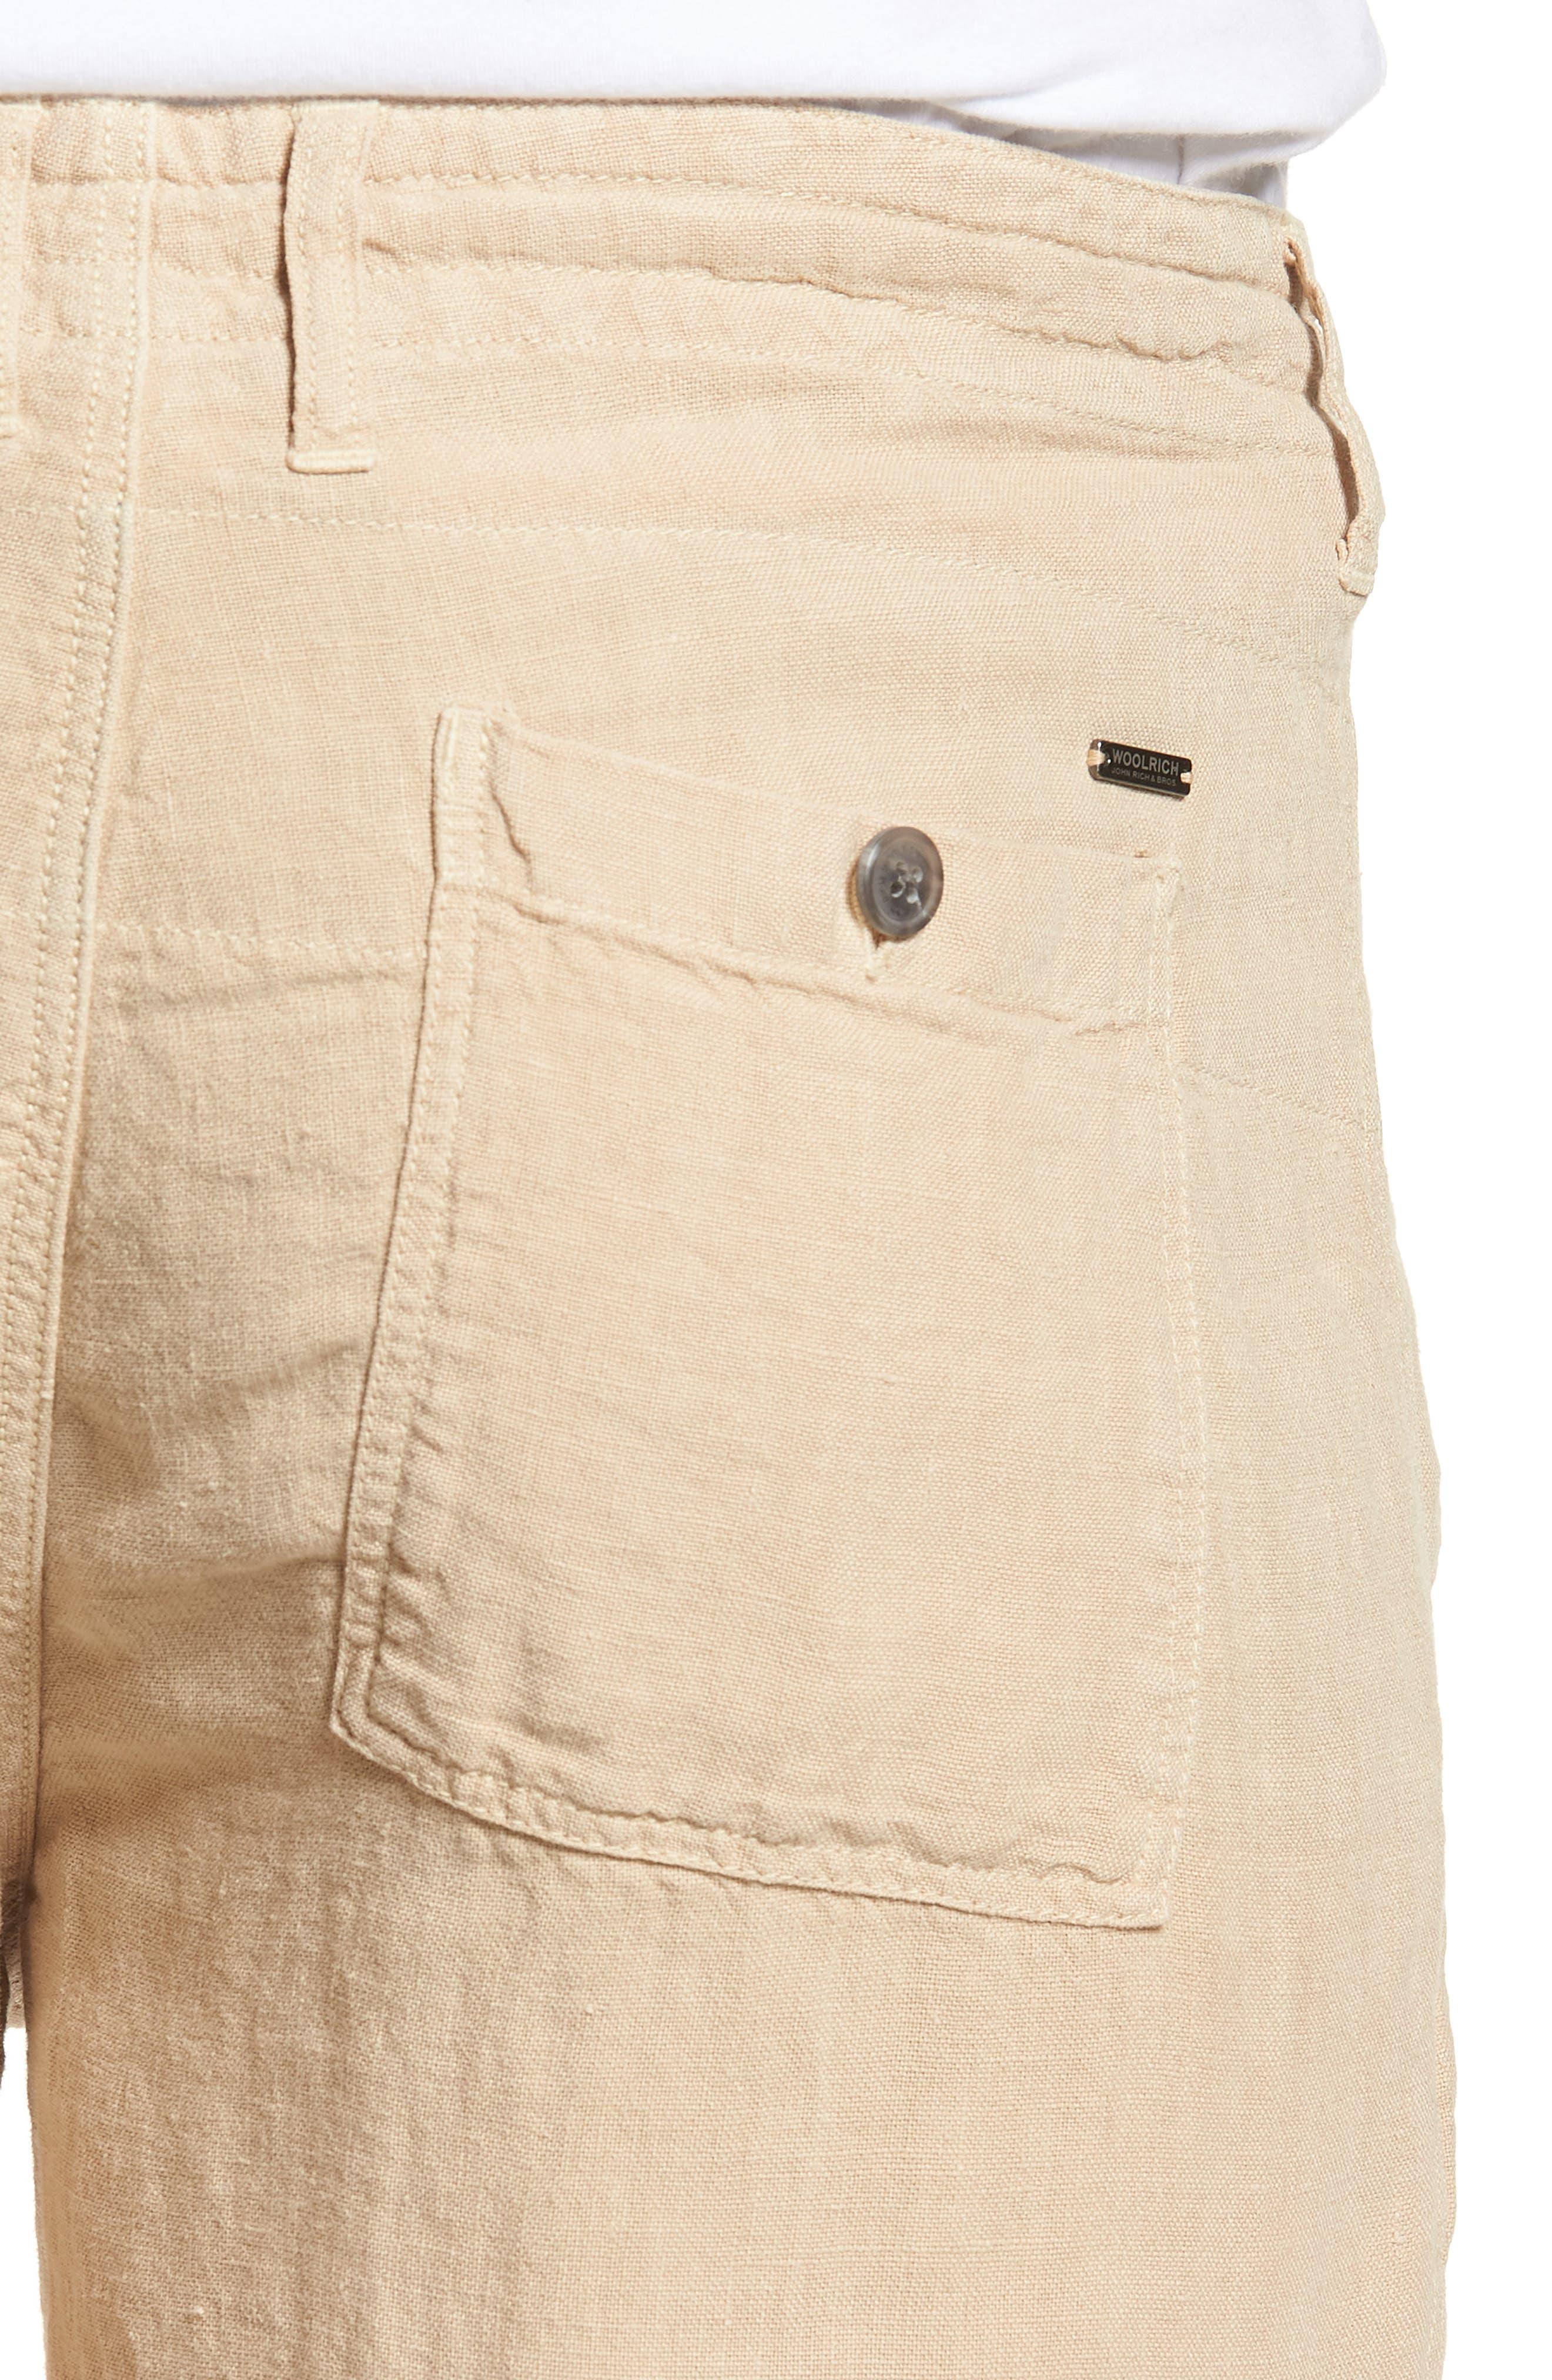 & Bros. Linen Shorts,                             Alternate thumbnail 4, color,                             200